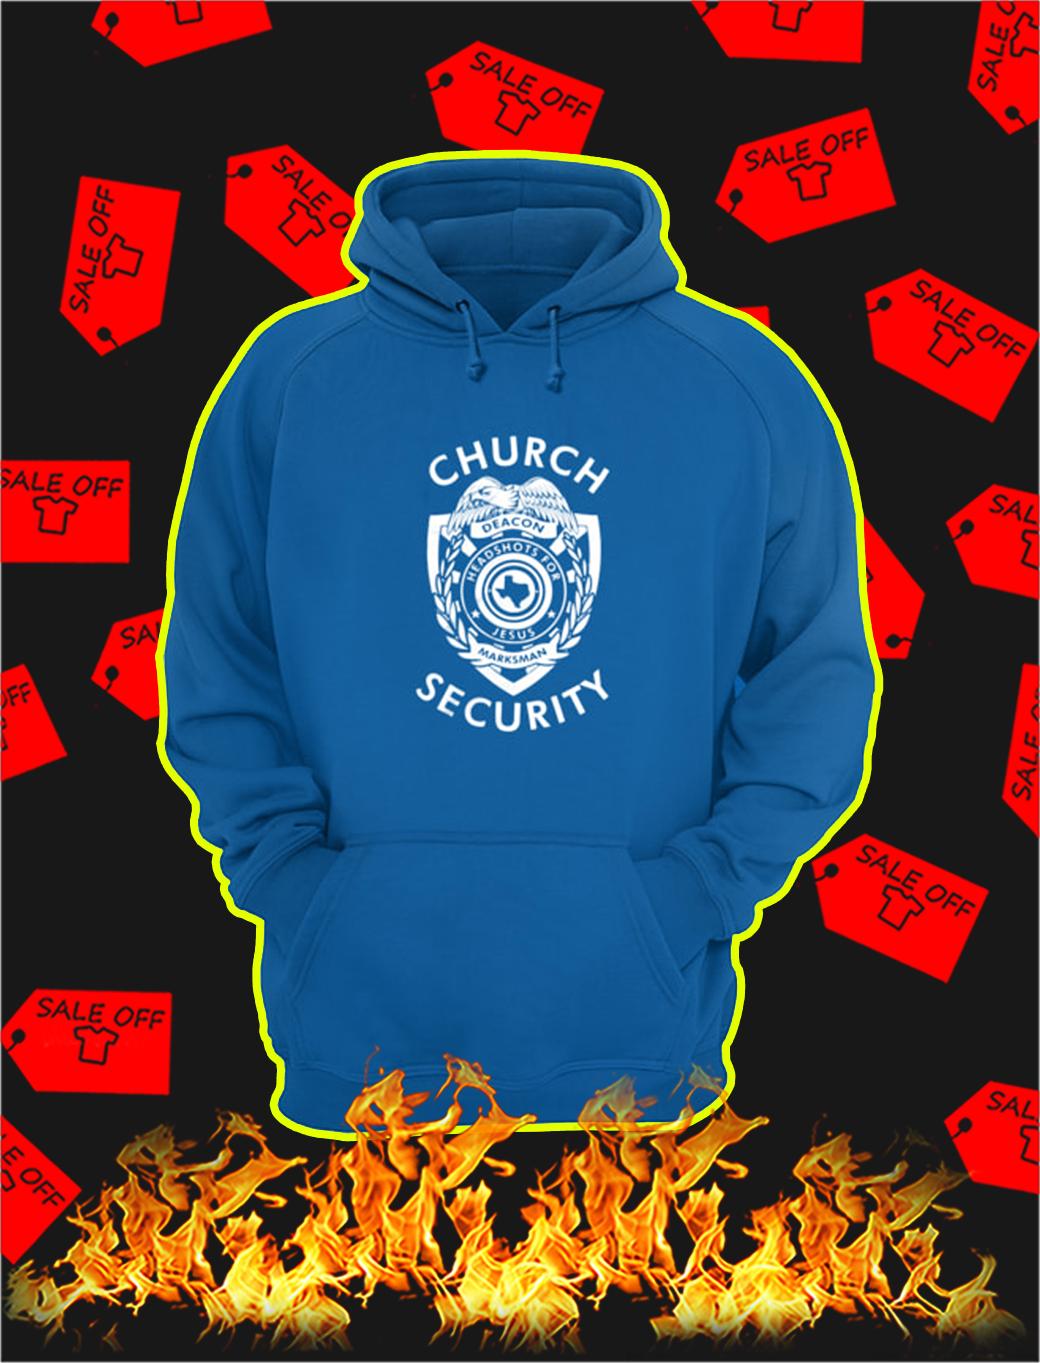 Church Security hoodie